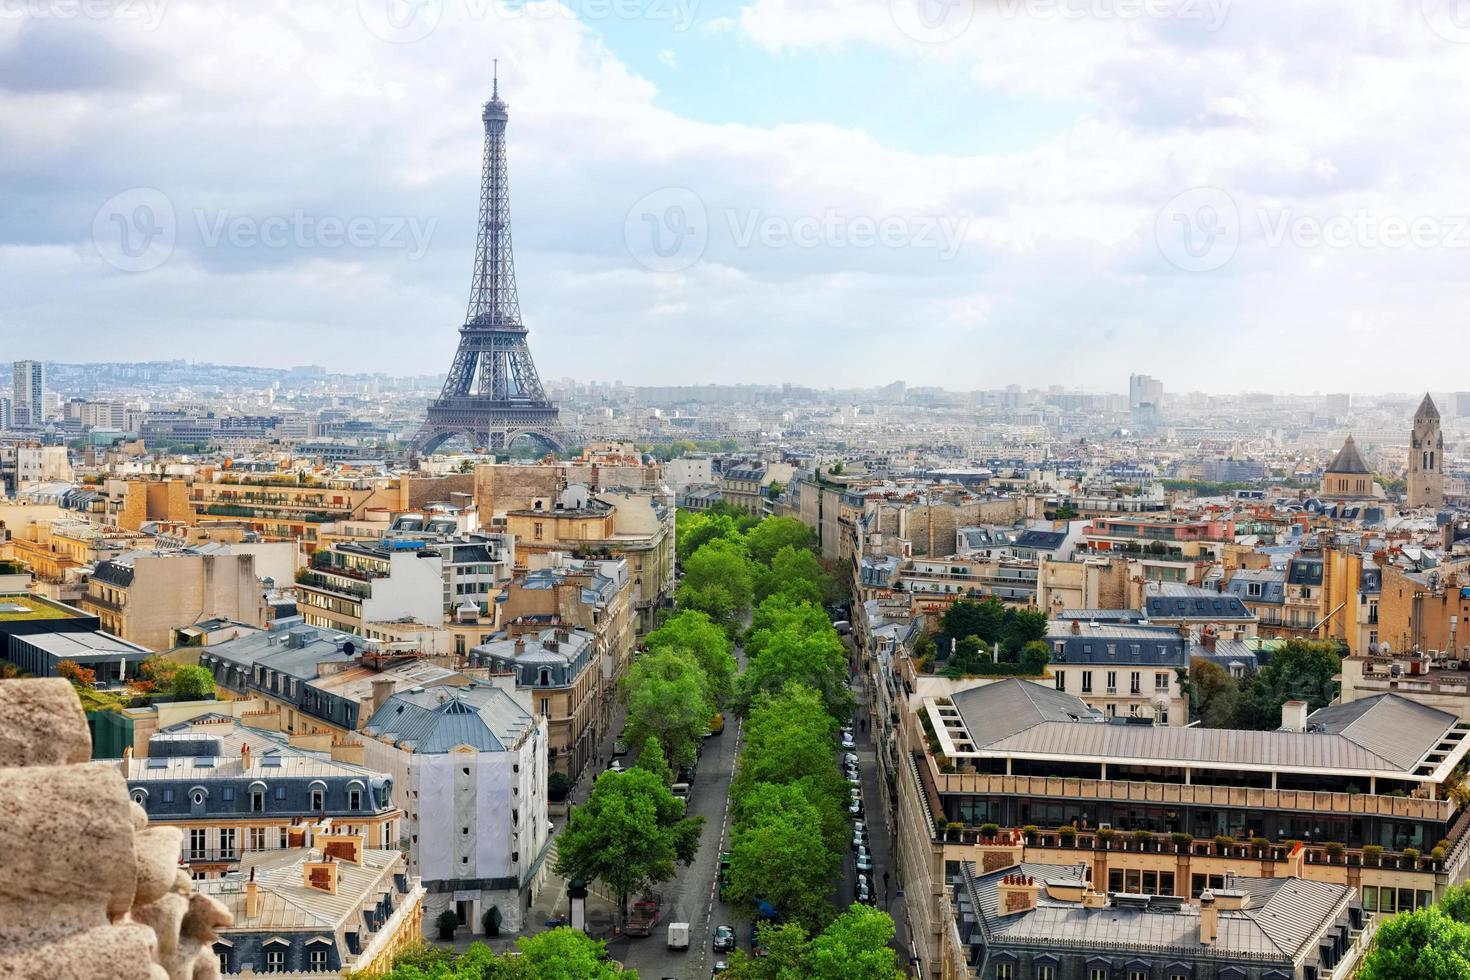 vista di Parigi dall'arco di trionfo. .Parigi. Francia. foto